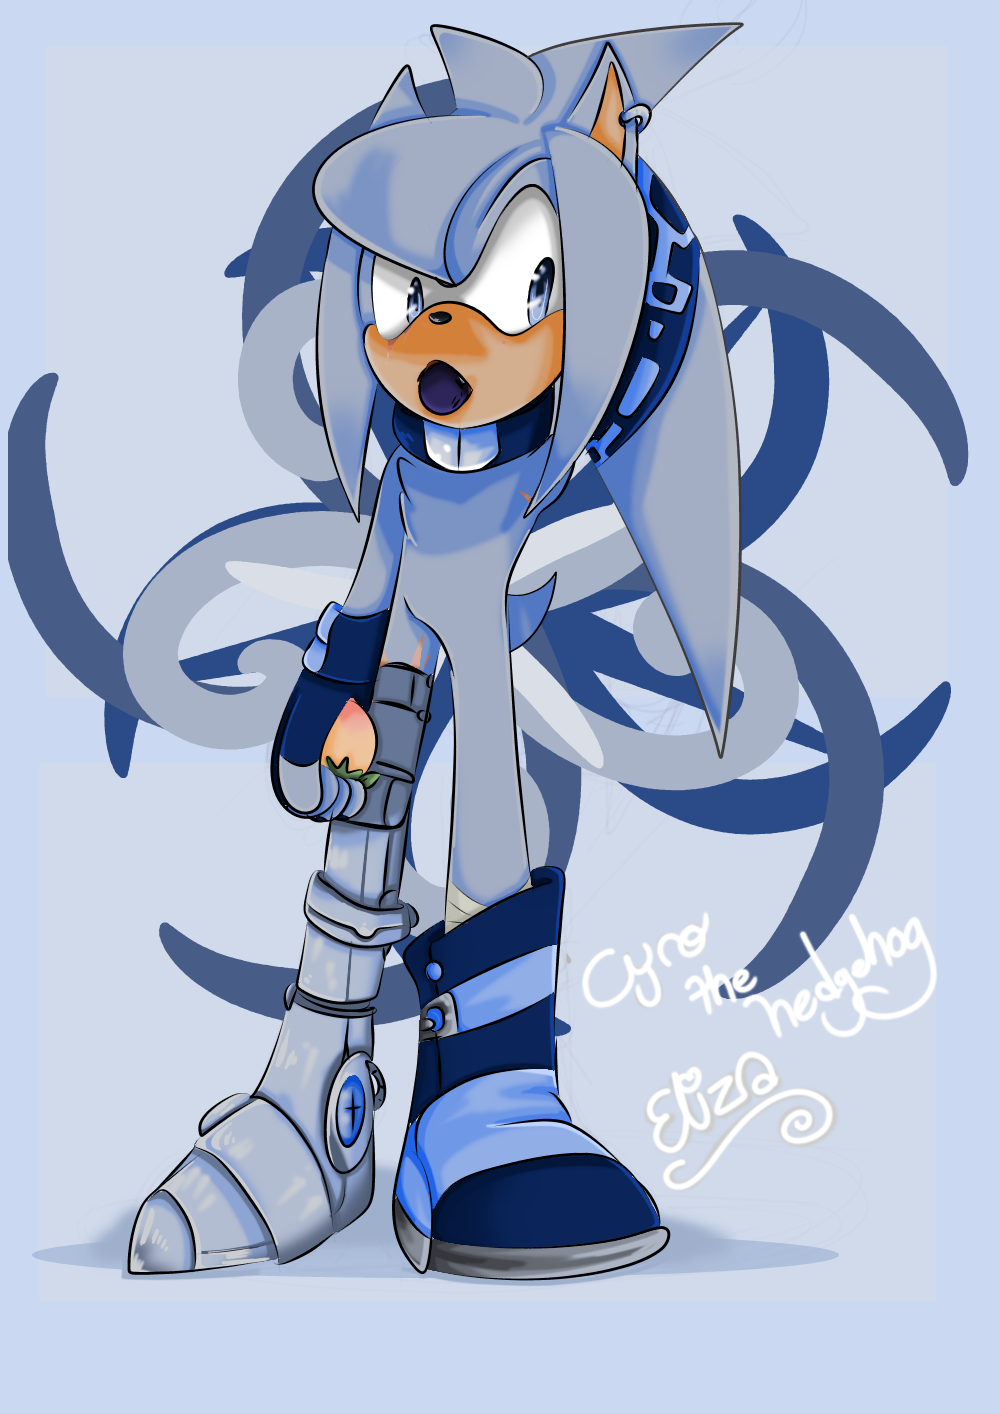 Cyro the hedgehog